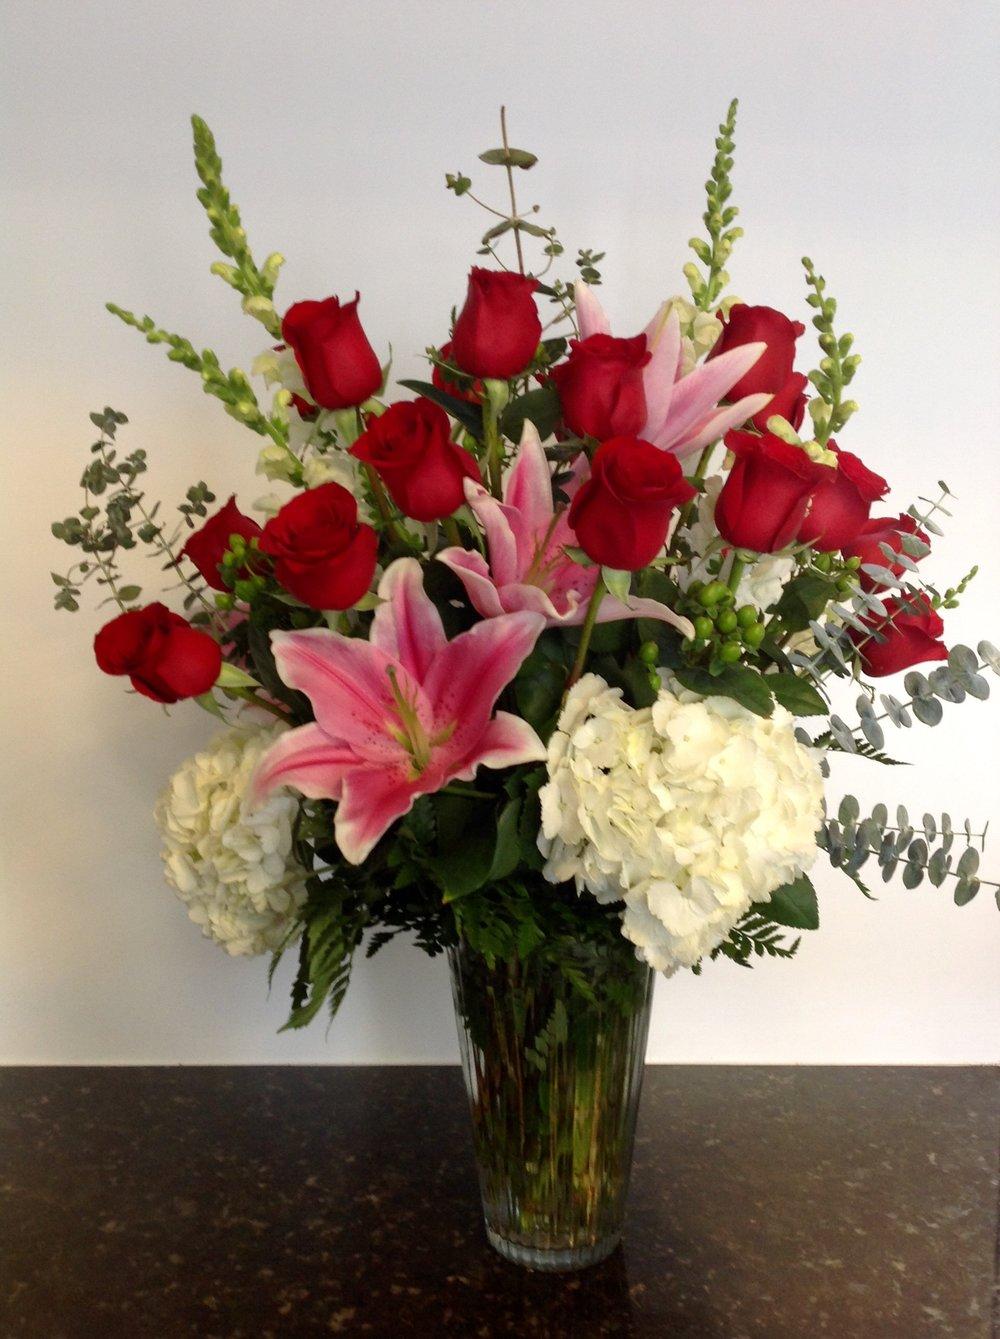 Timeless Romance Bouquet  - 1 Dozen roses $150 • 2 Dozen roses $225